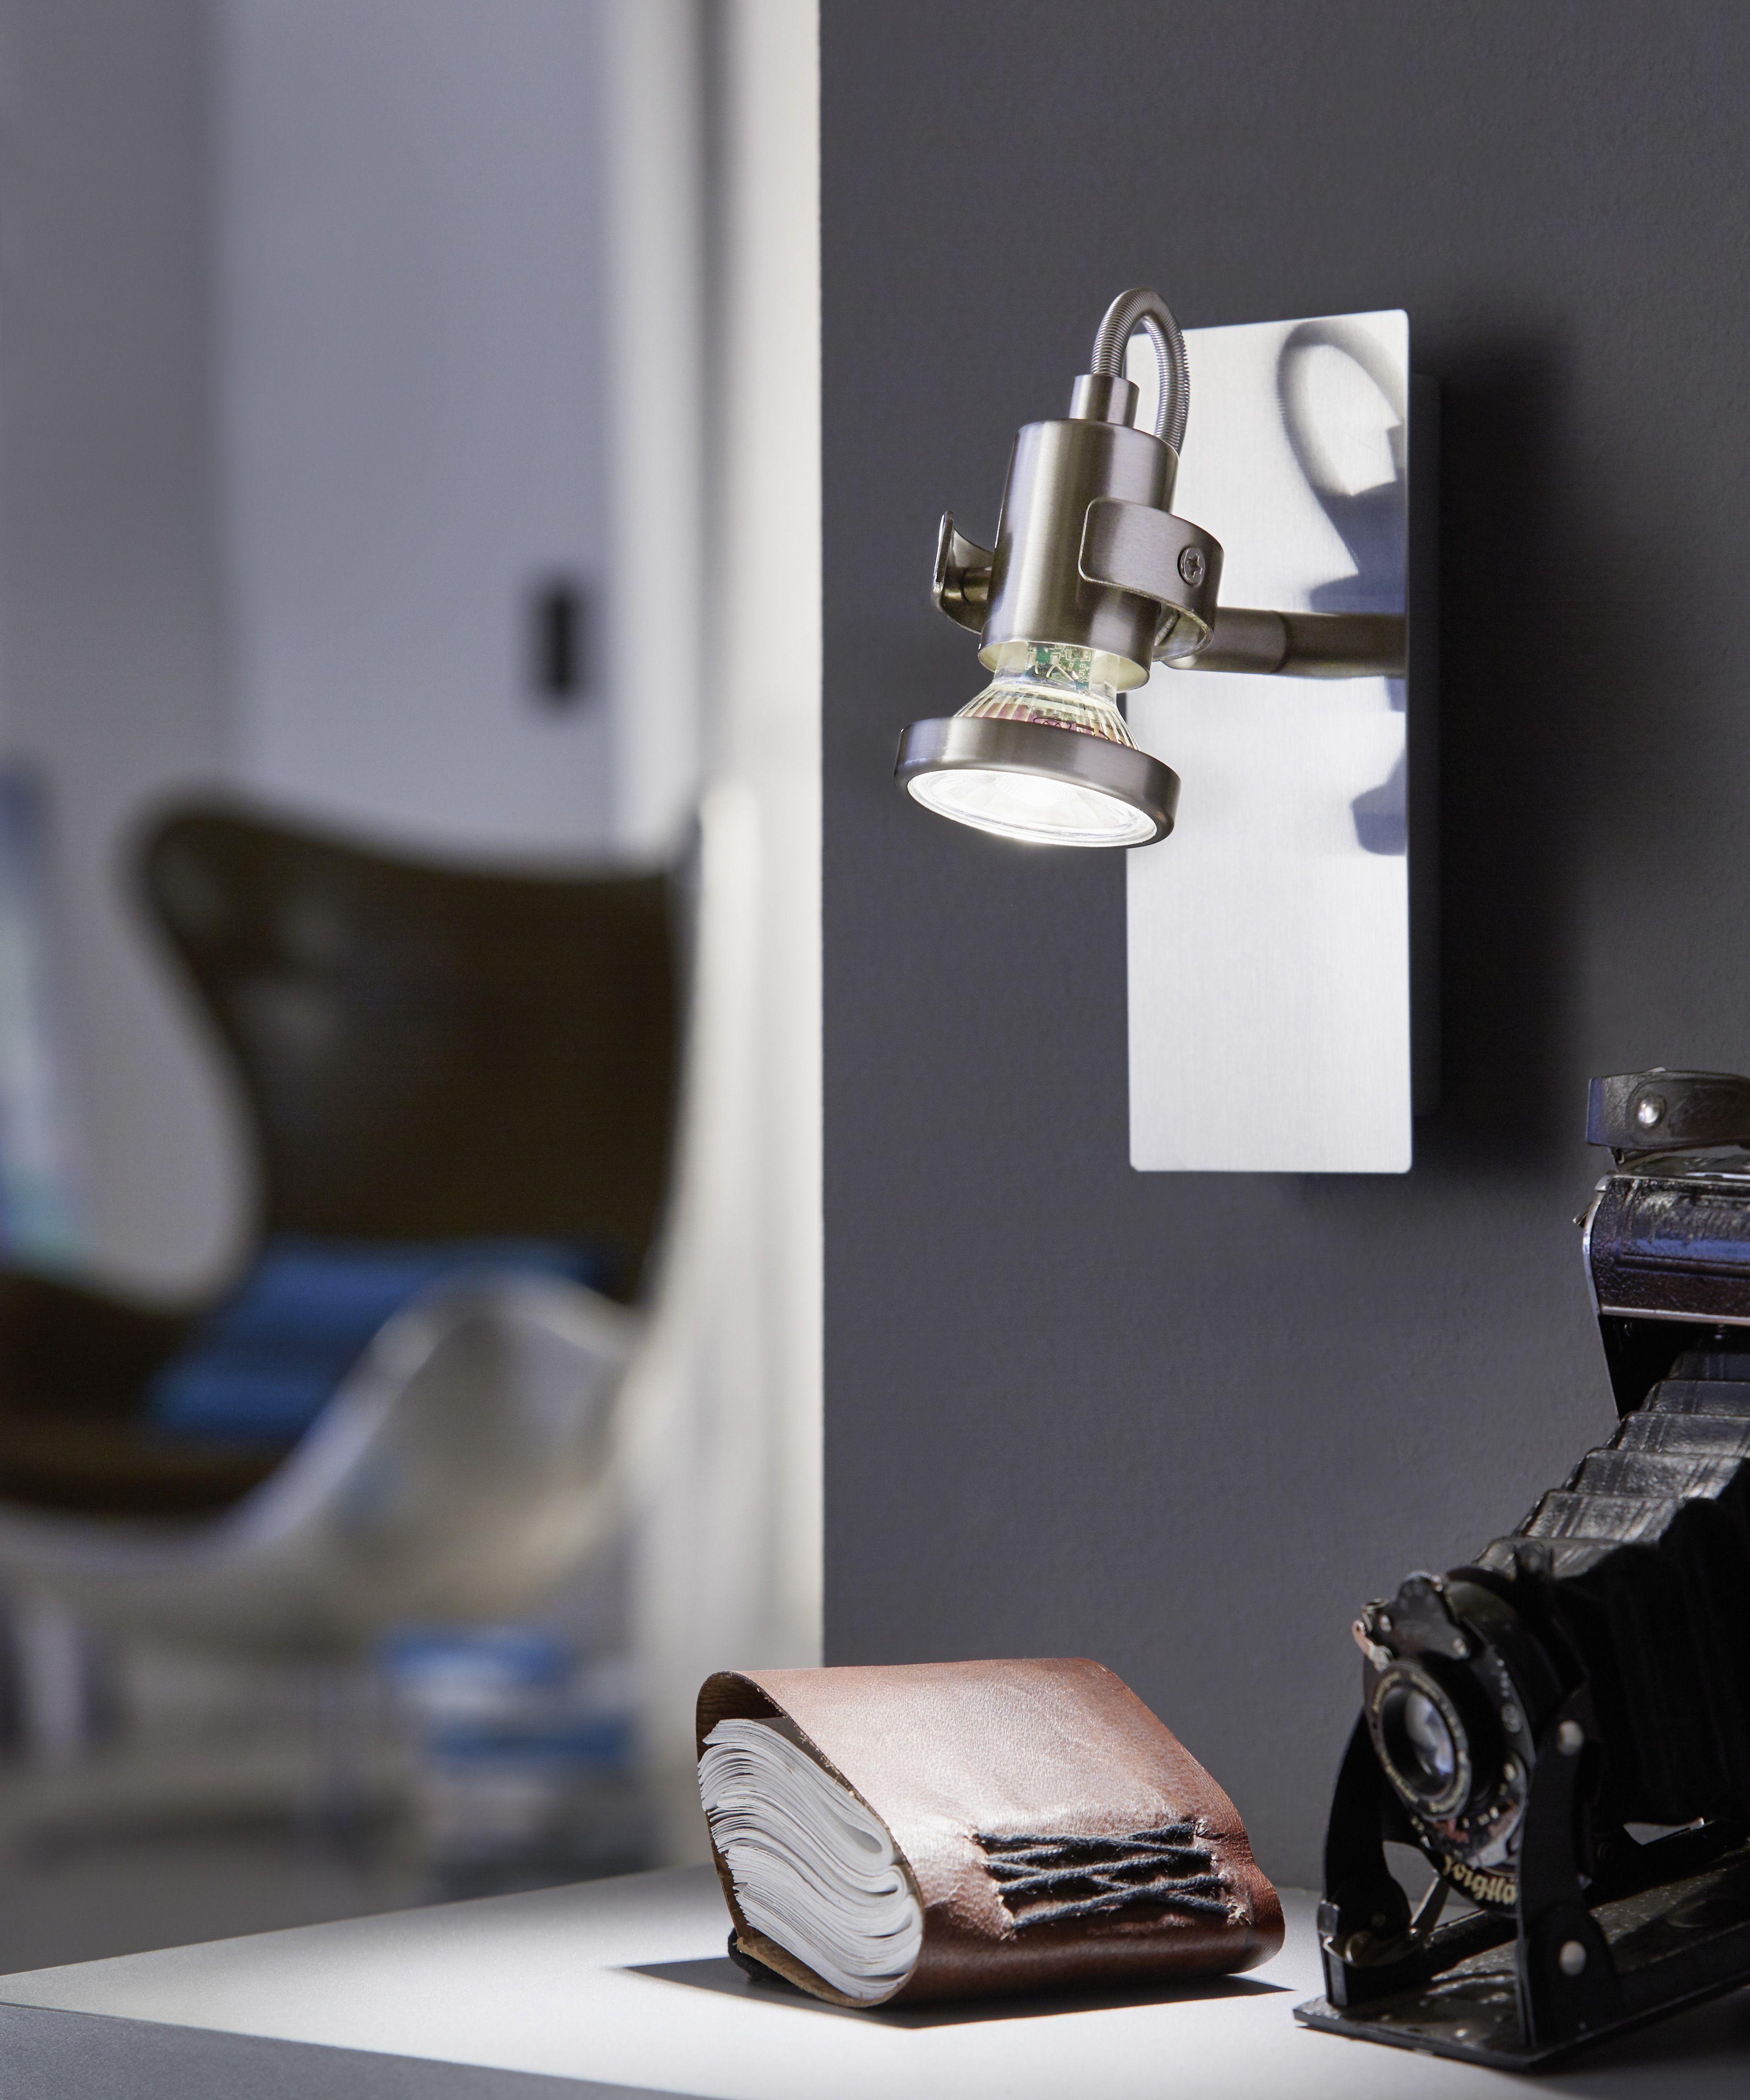 Eglo Lighting Tukon LED Satin Nickel Modern 1 Lamp Switched Spot